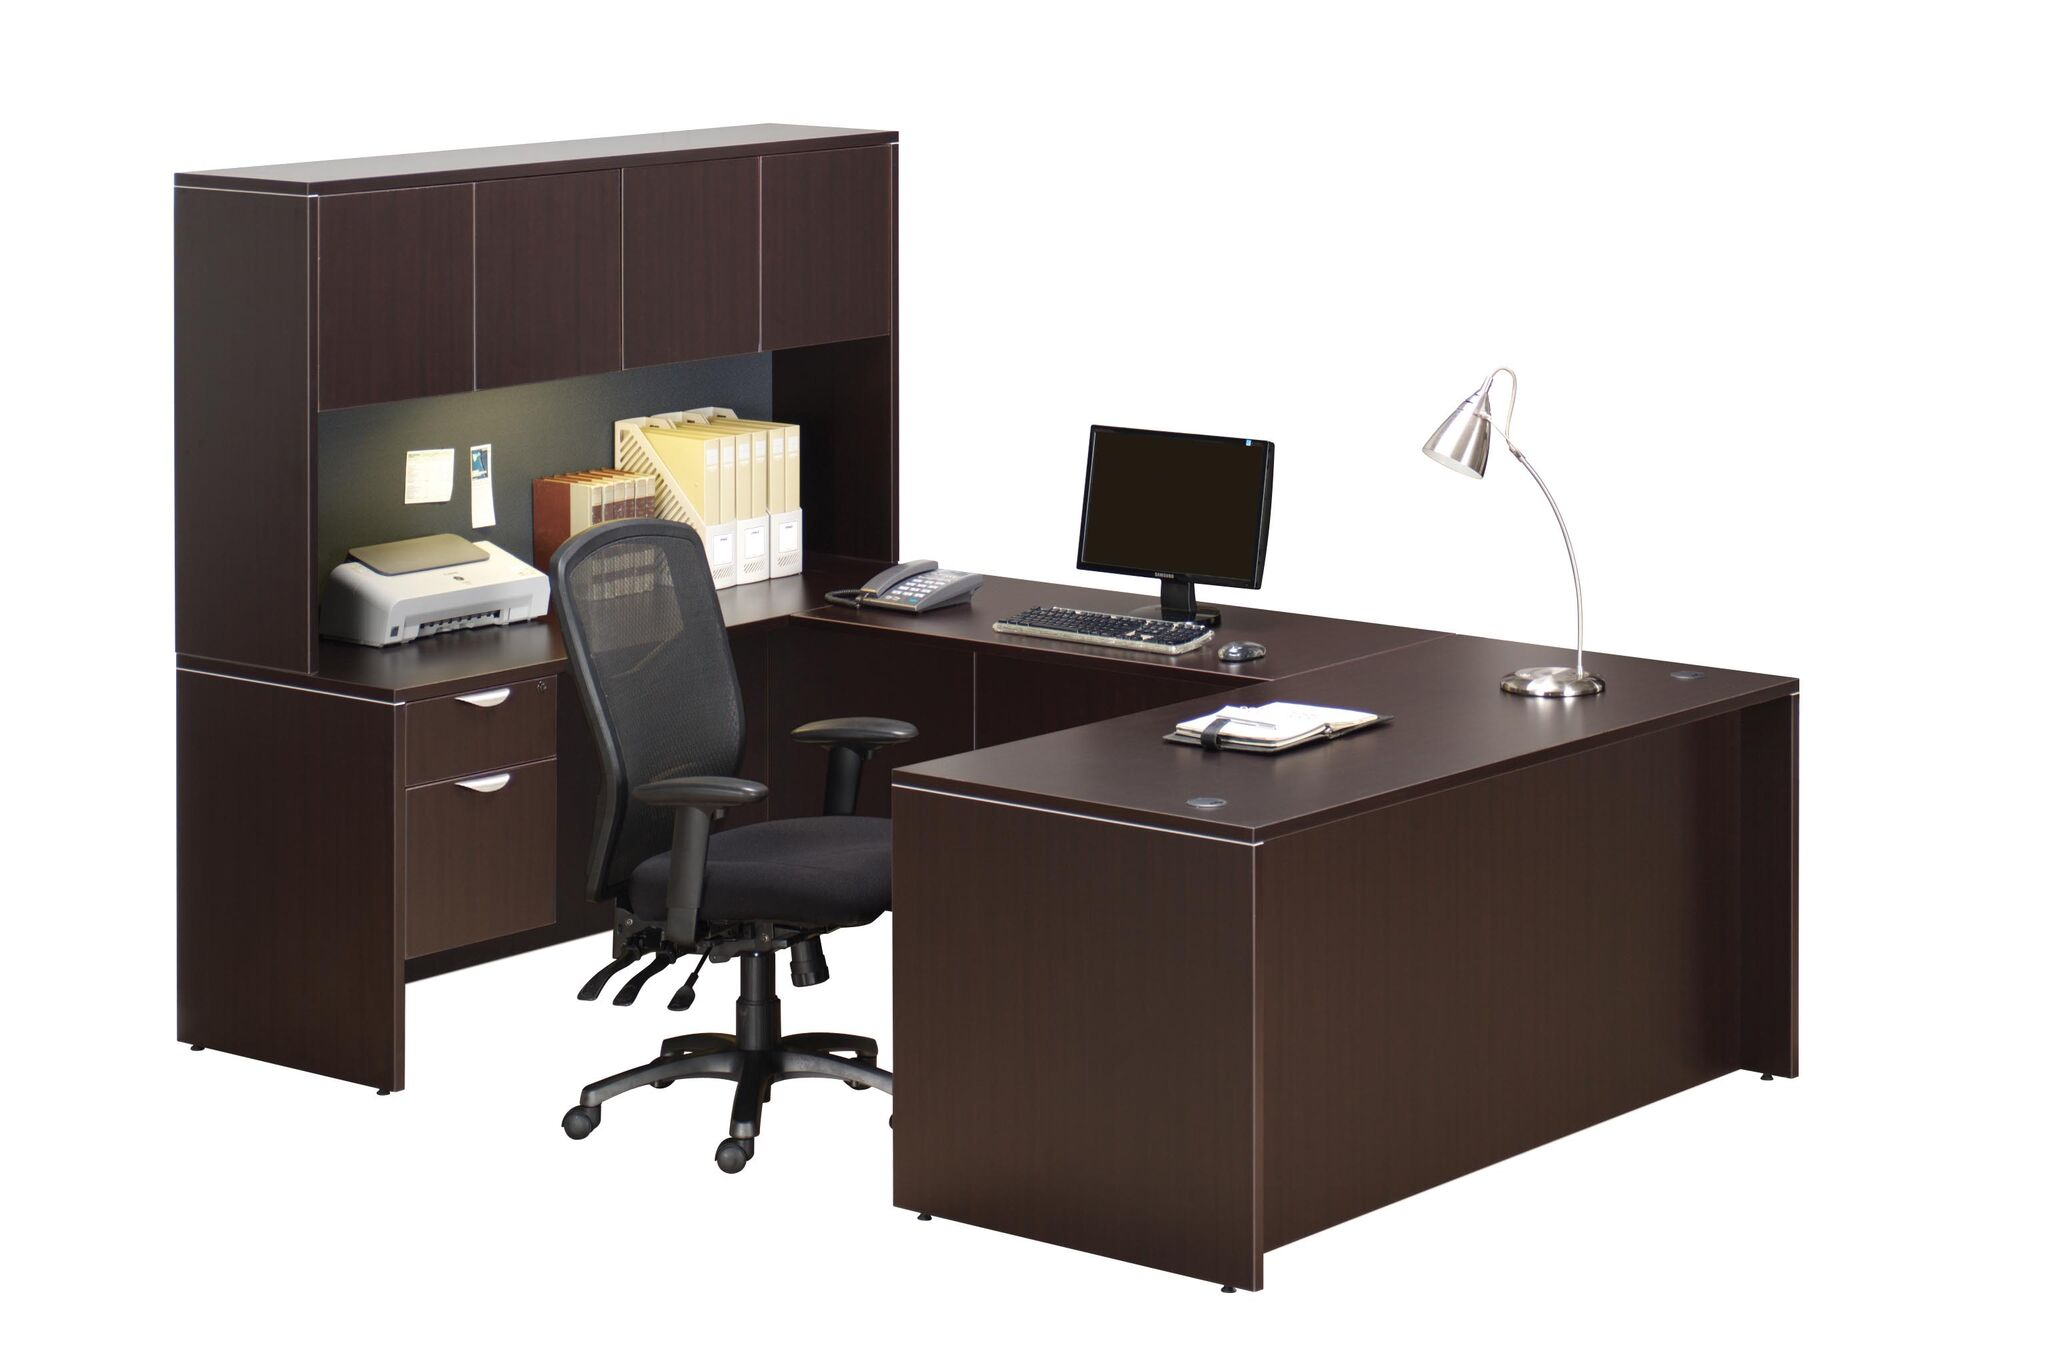 Whole Office Laminate 66 Ushape With Hutch